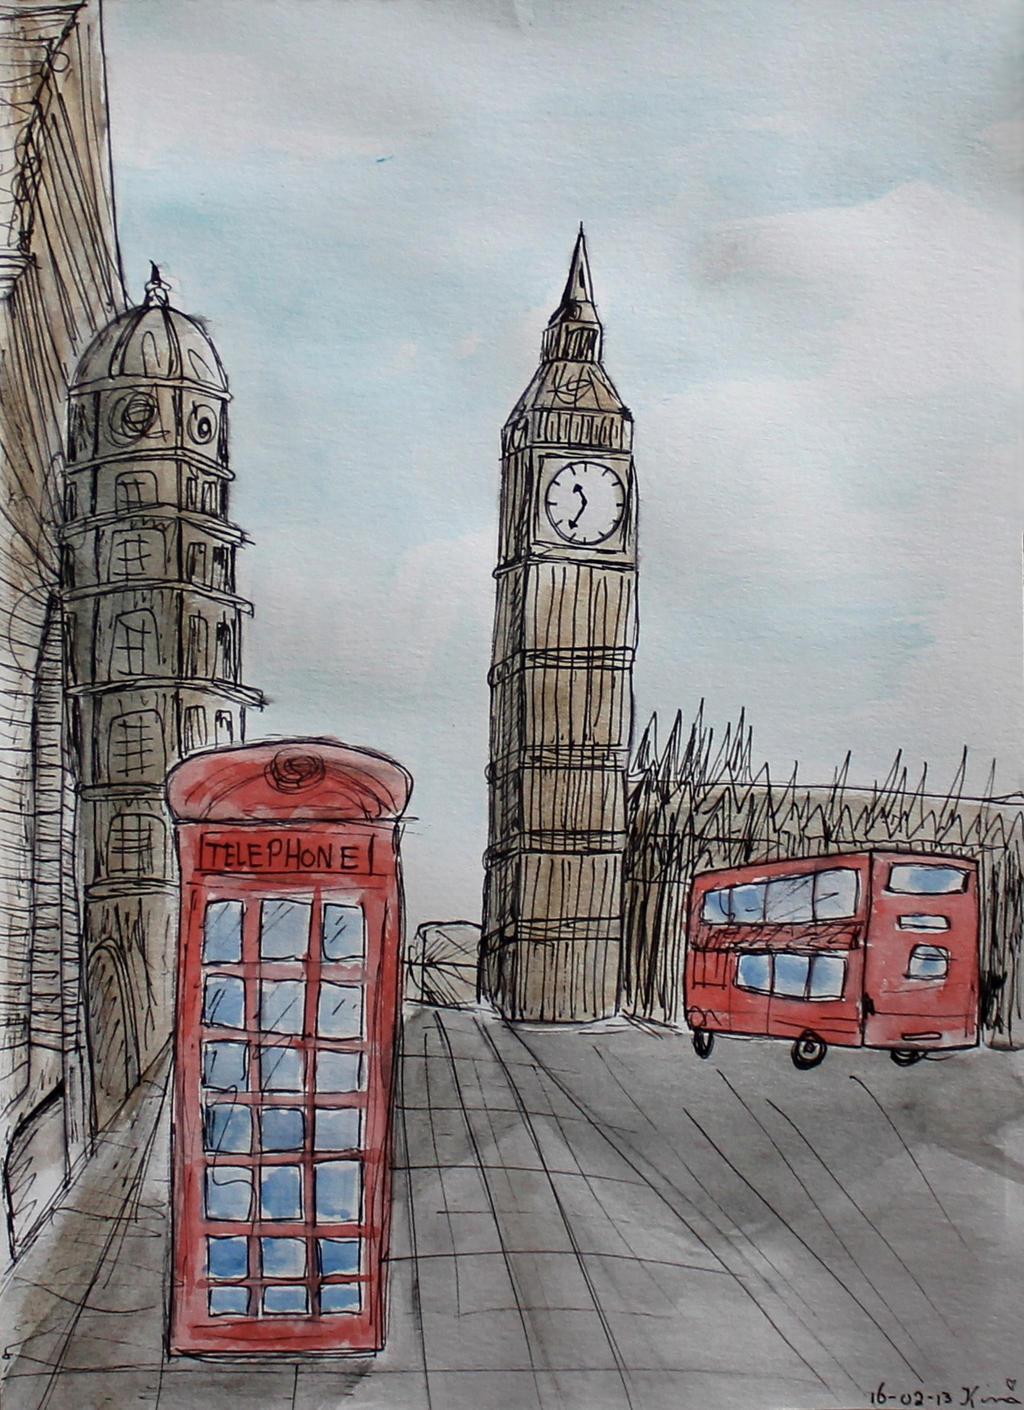 London by Kimmuurt